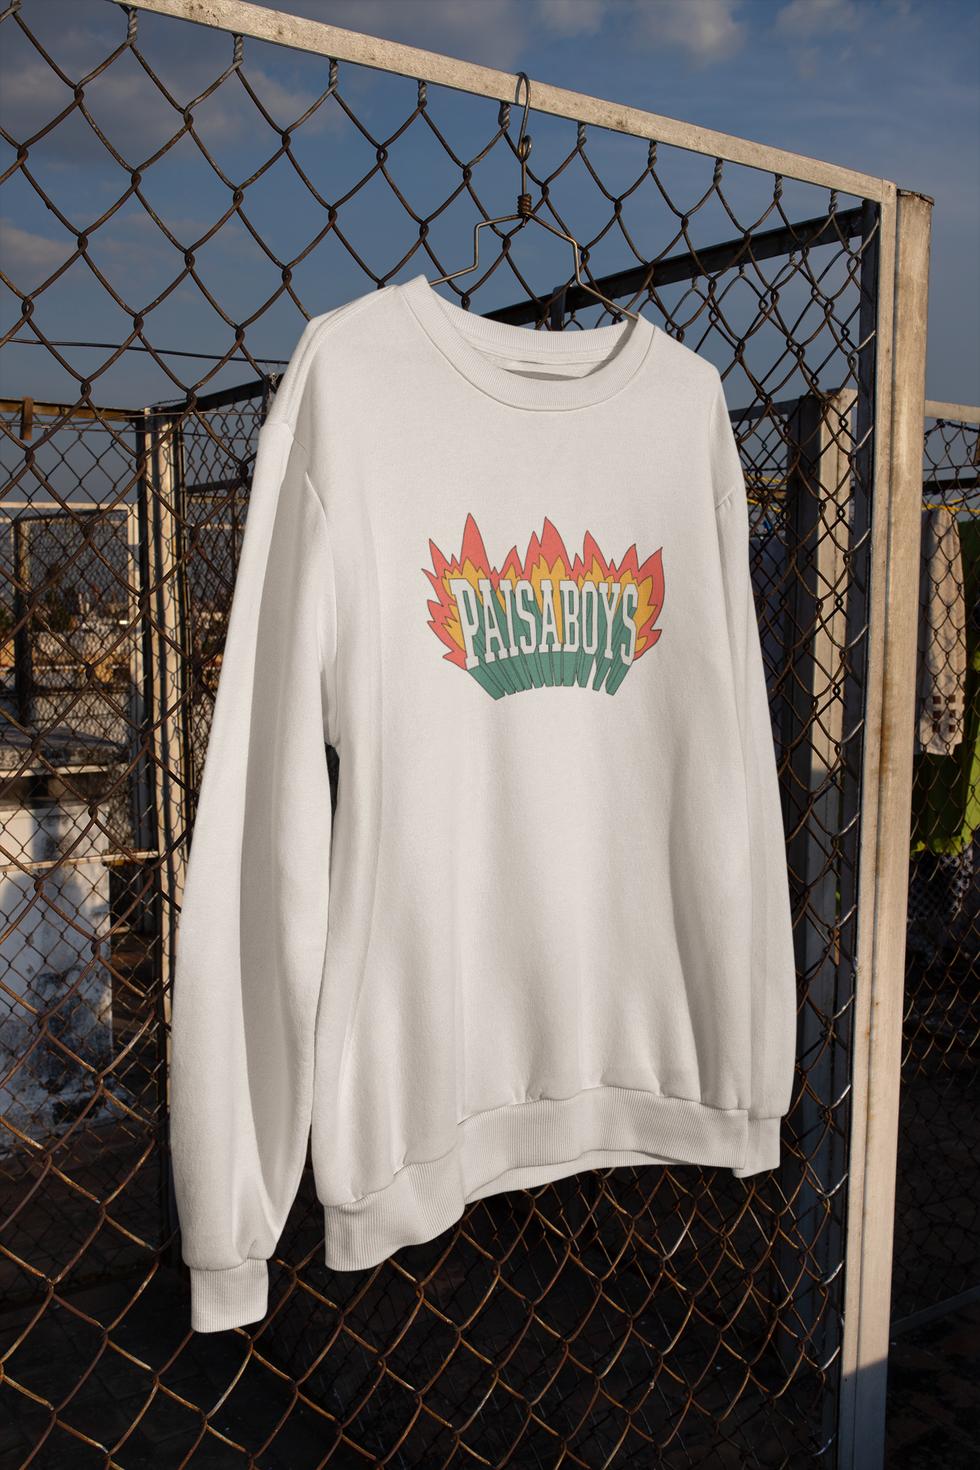 mockup-of-a-crewneck-sweatshirt-hangin-o